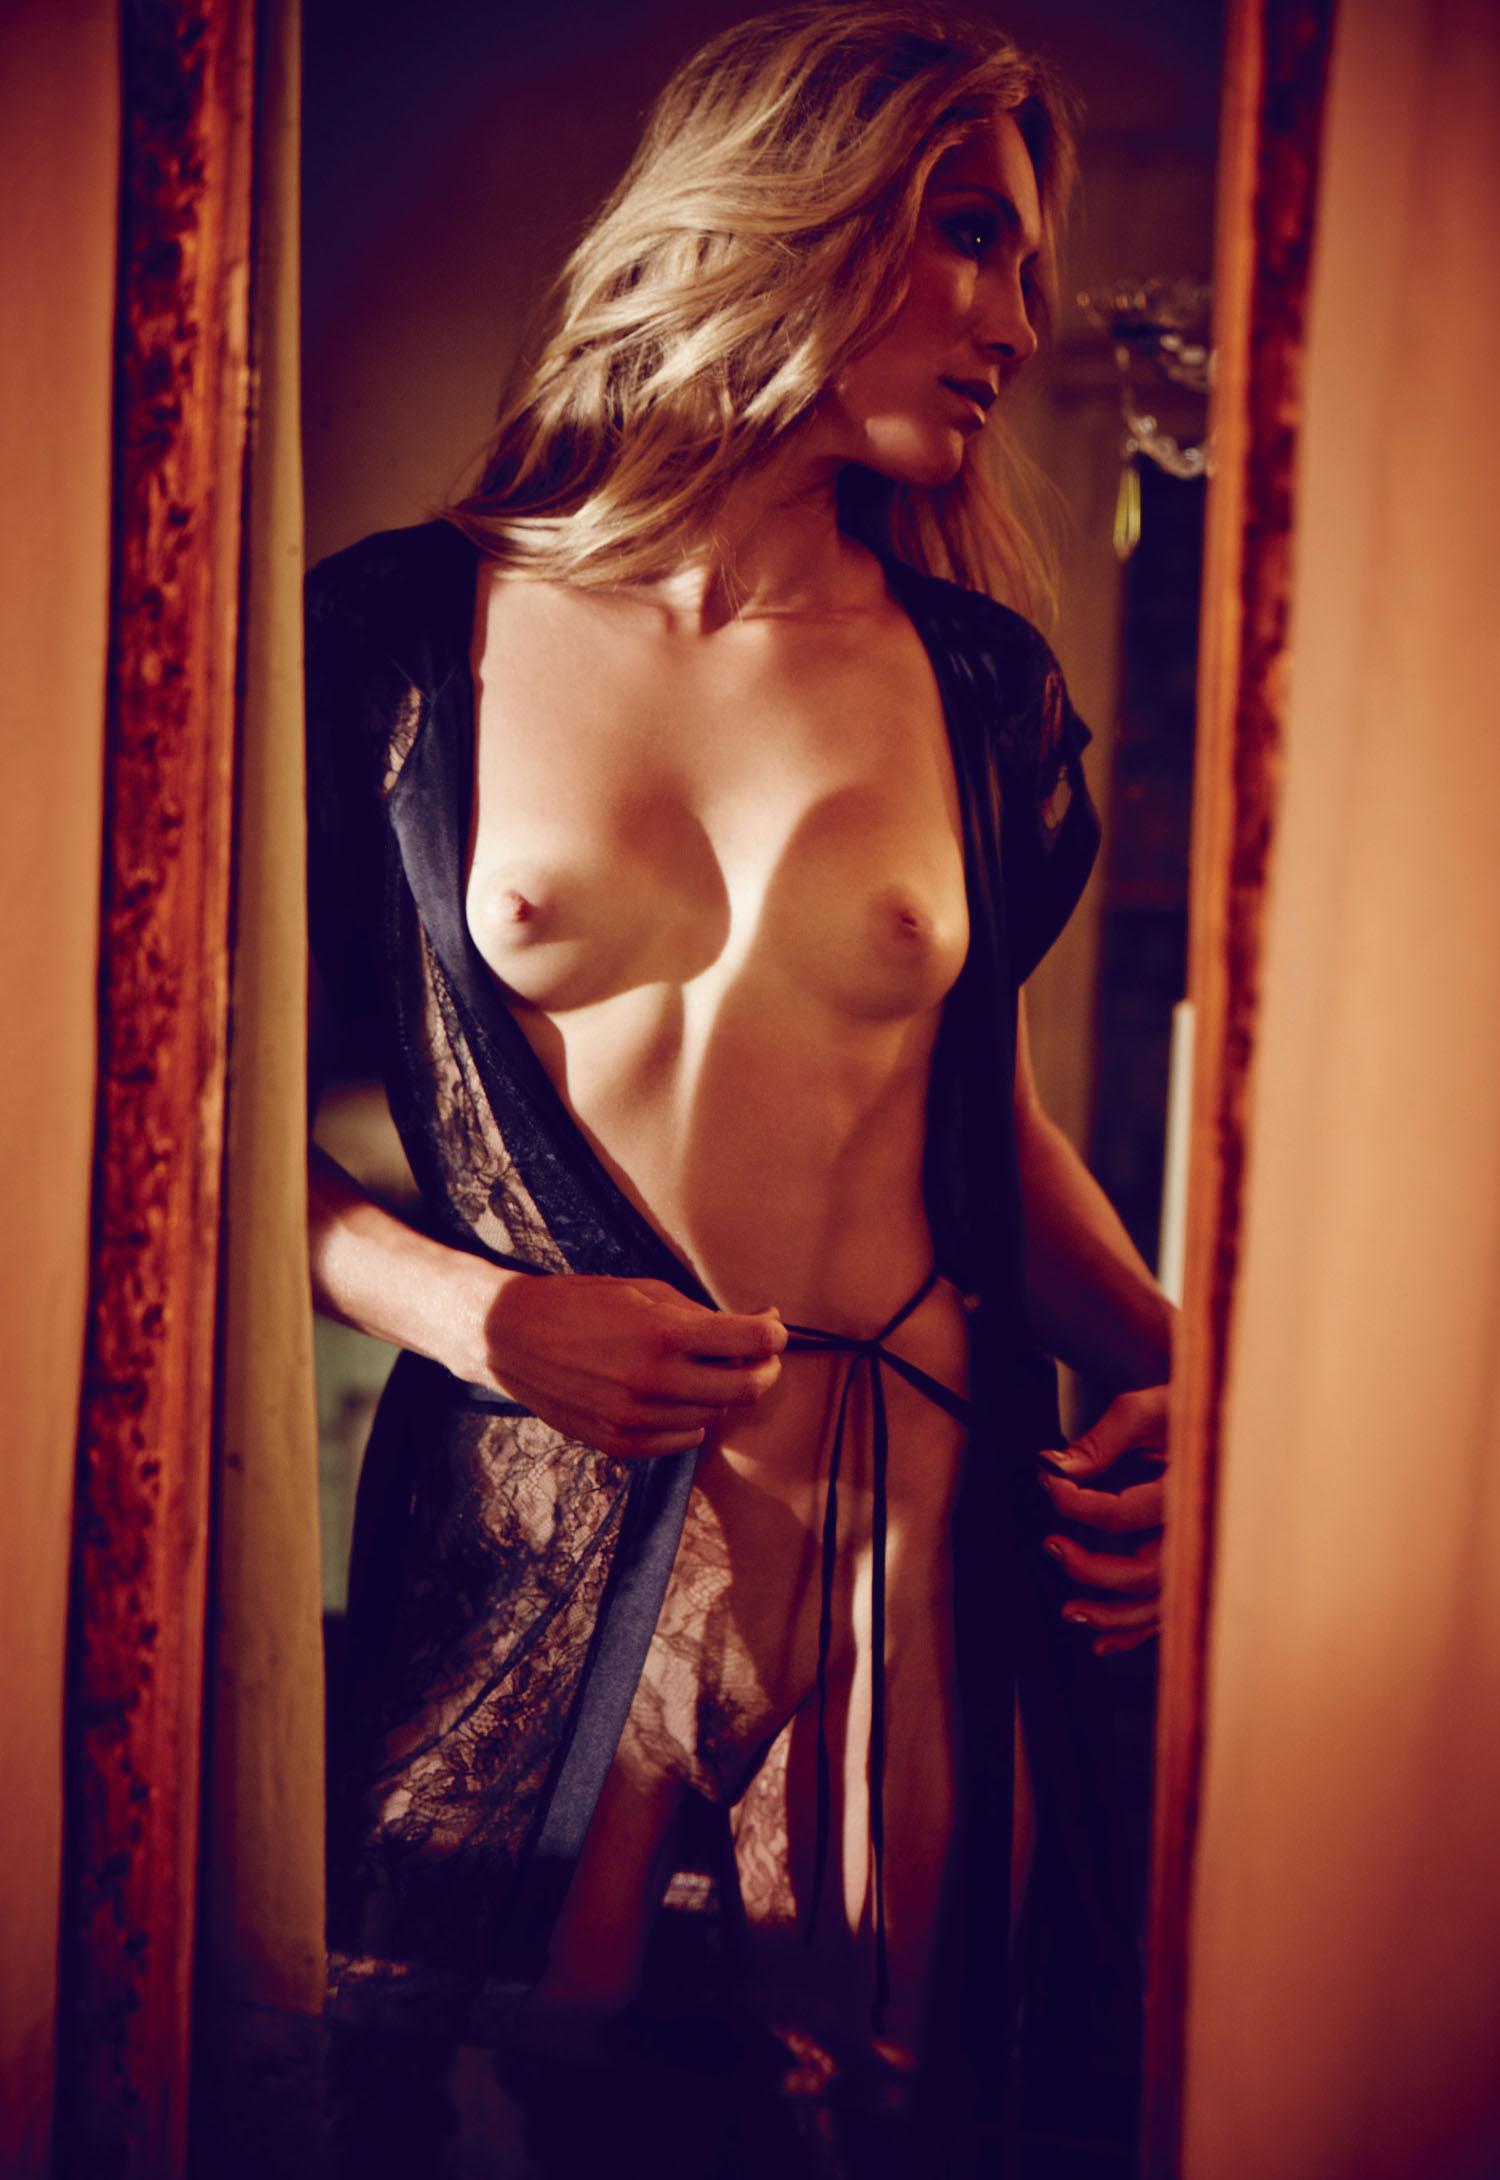 Кристин Тэйсс голая. Фото - 45